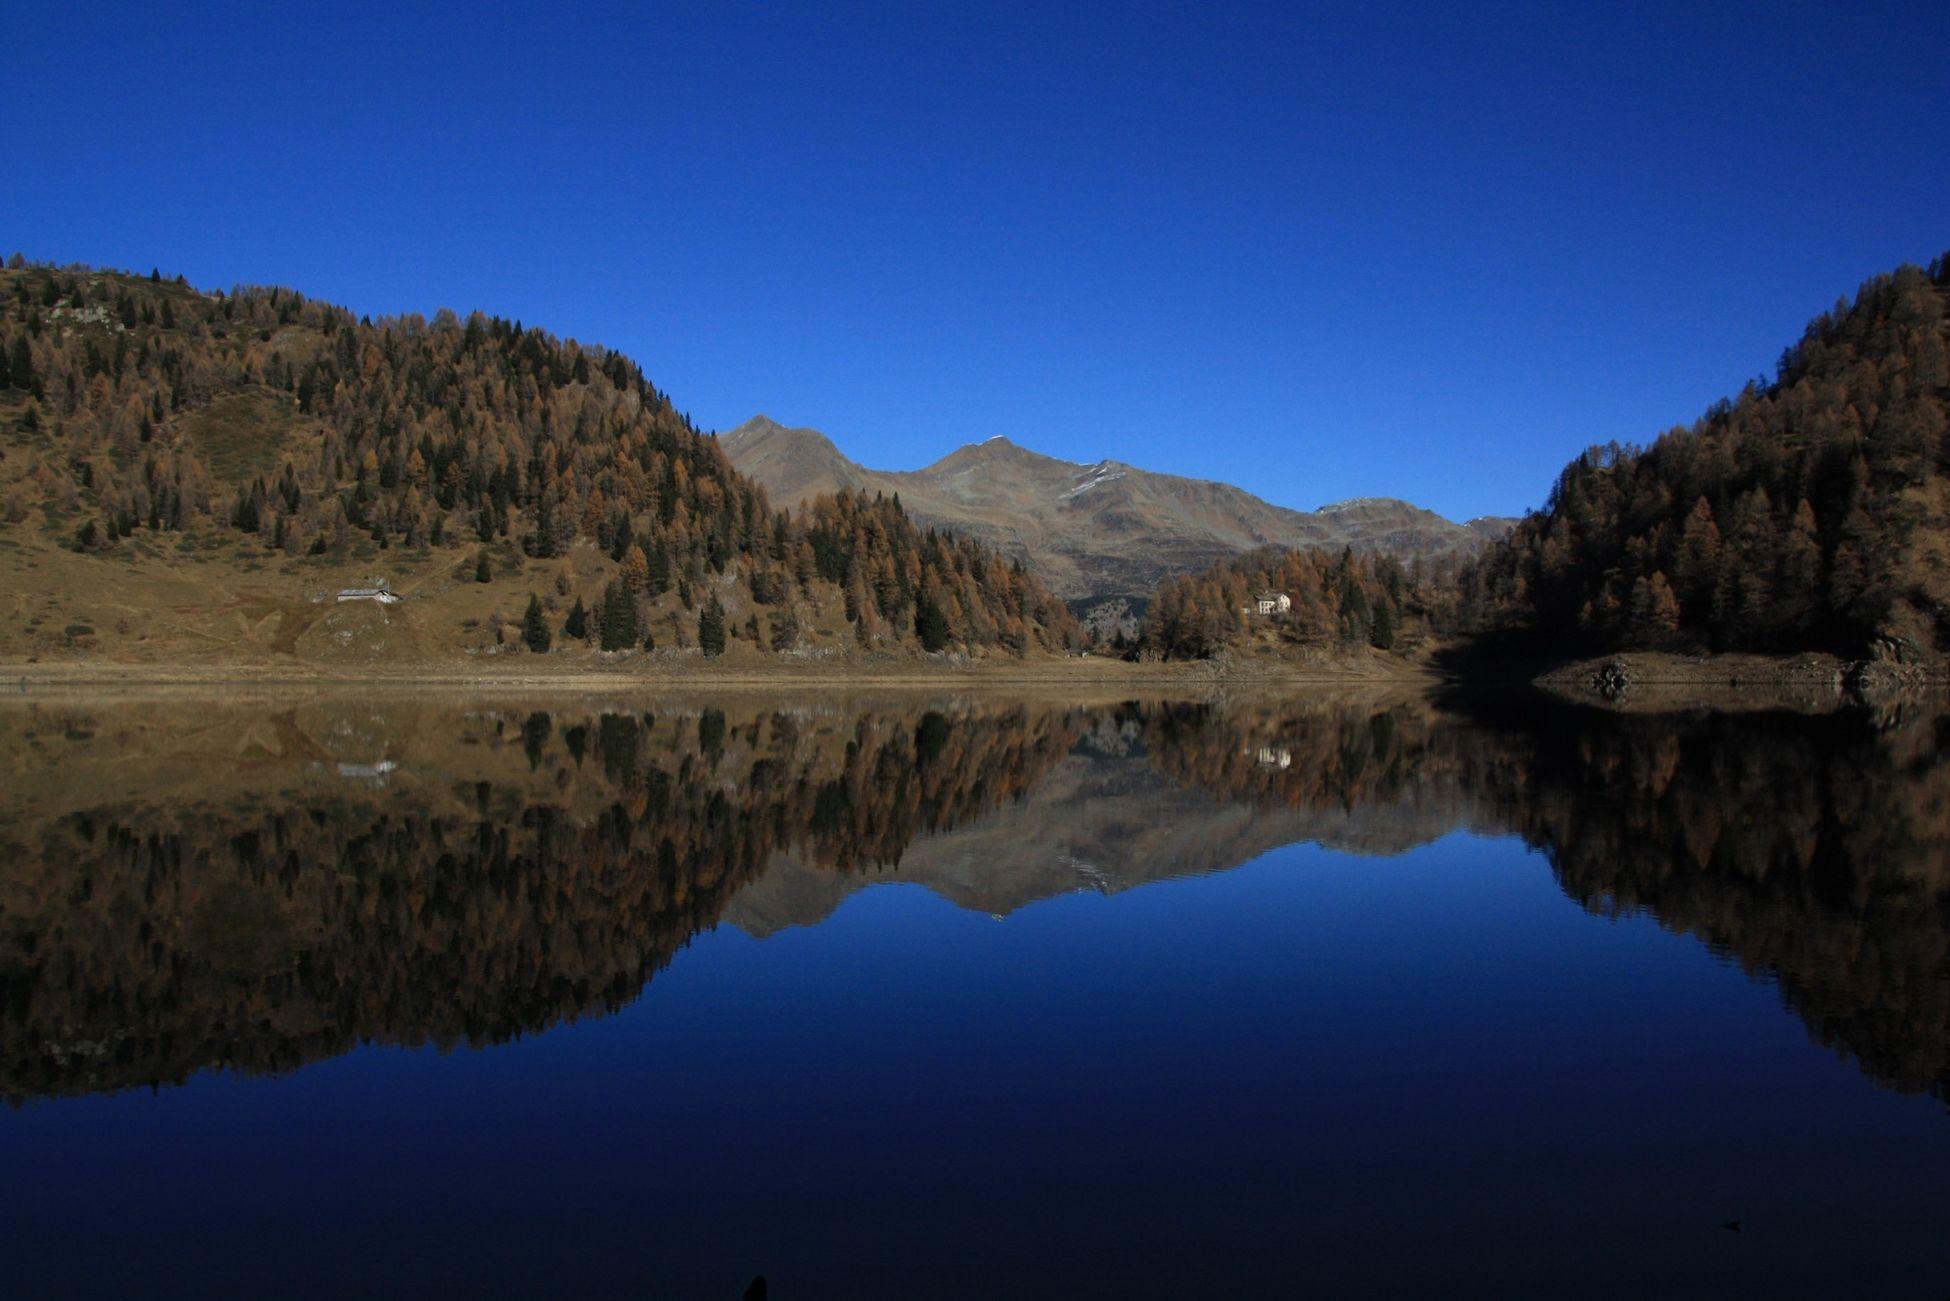 Lago Tremorgio Svizzera Sentierando Trekking Riflessi Autumn Colors The Magic Mission